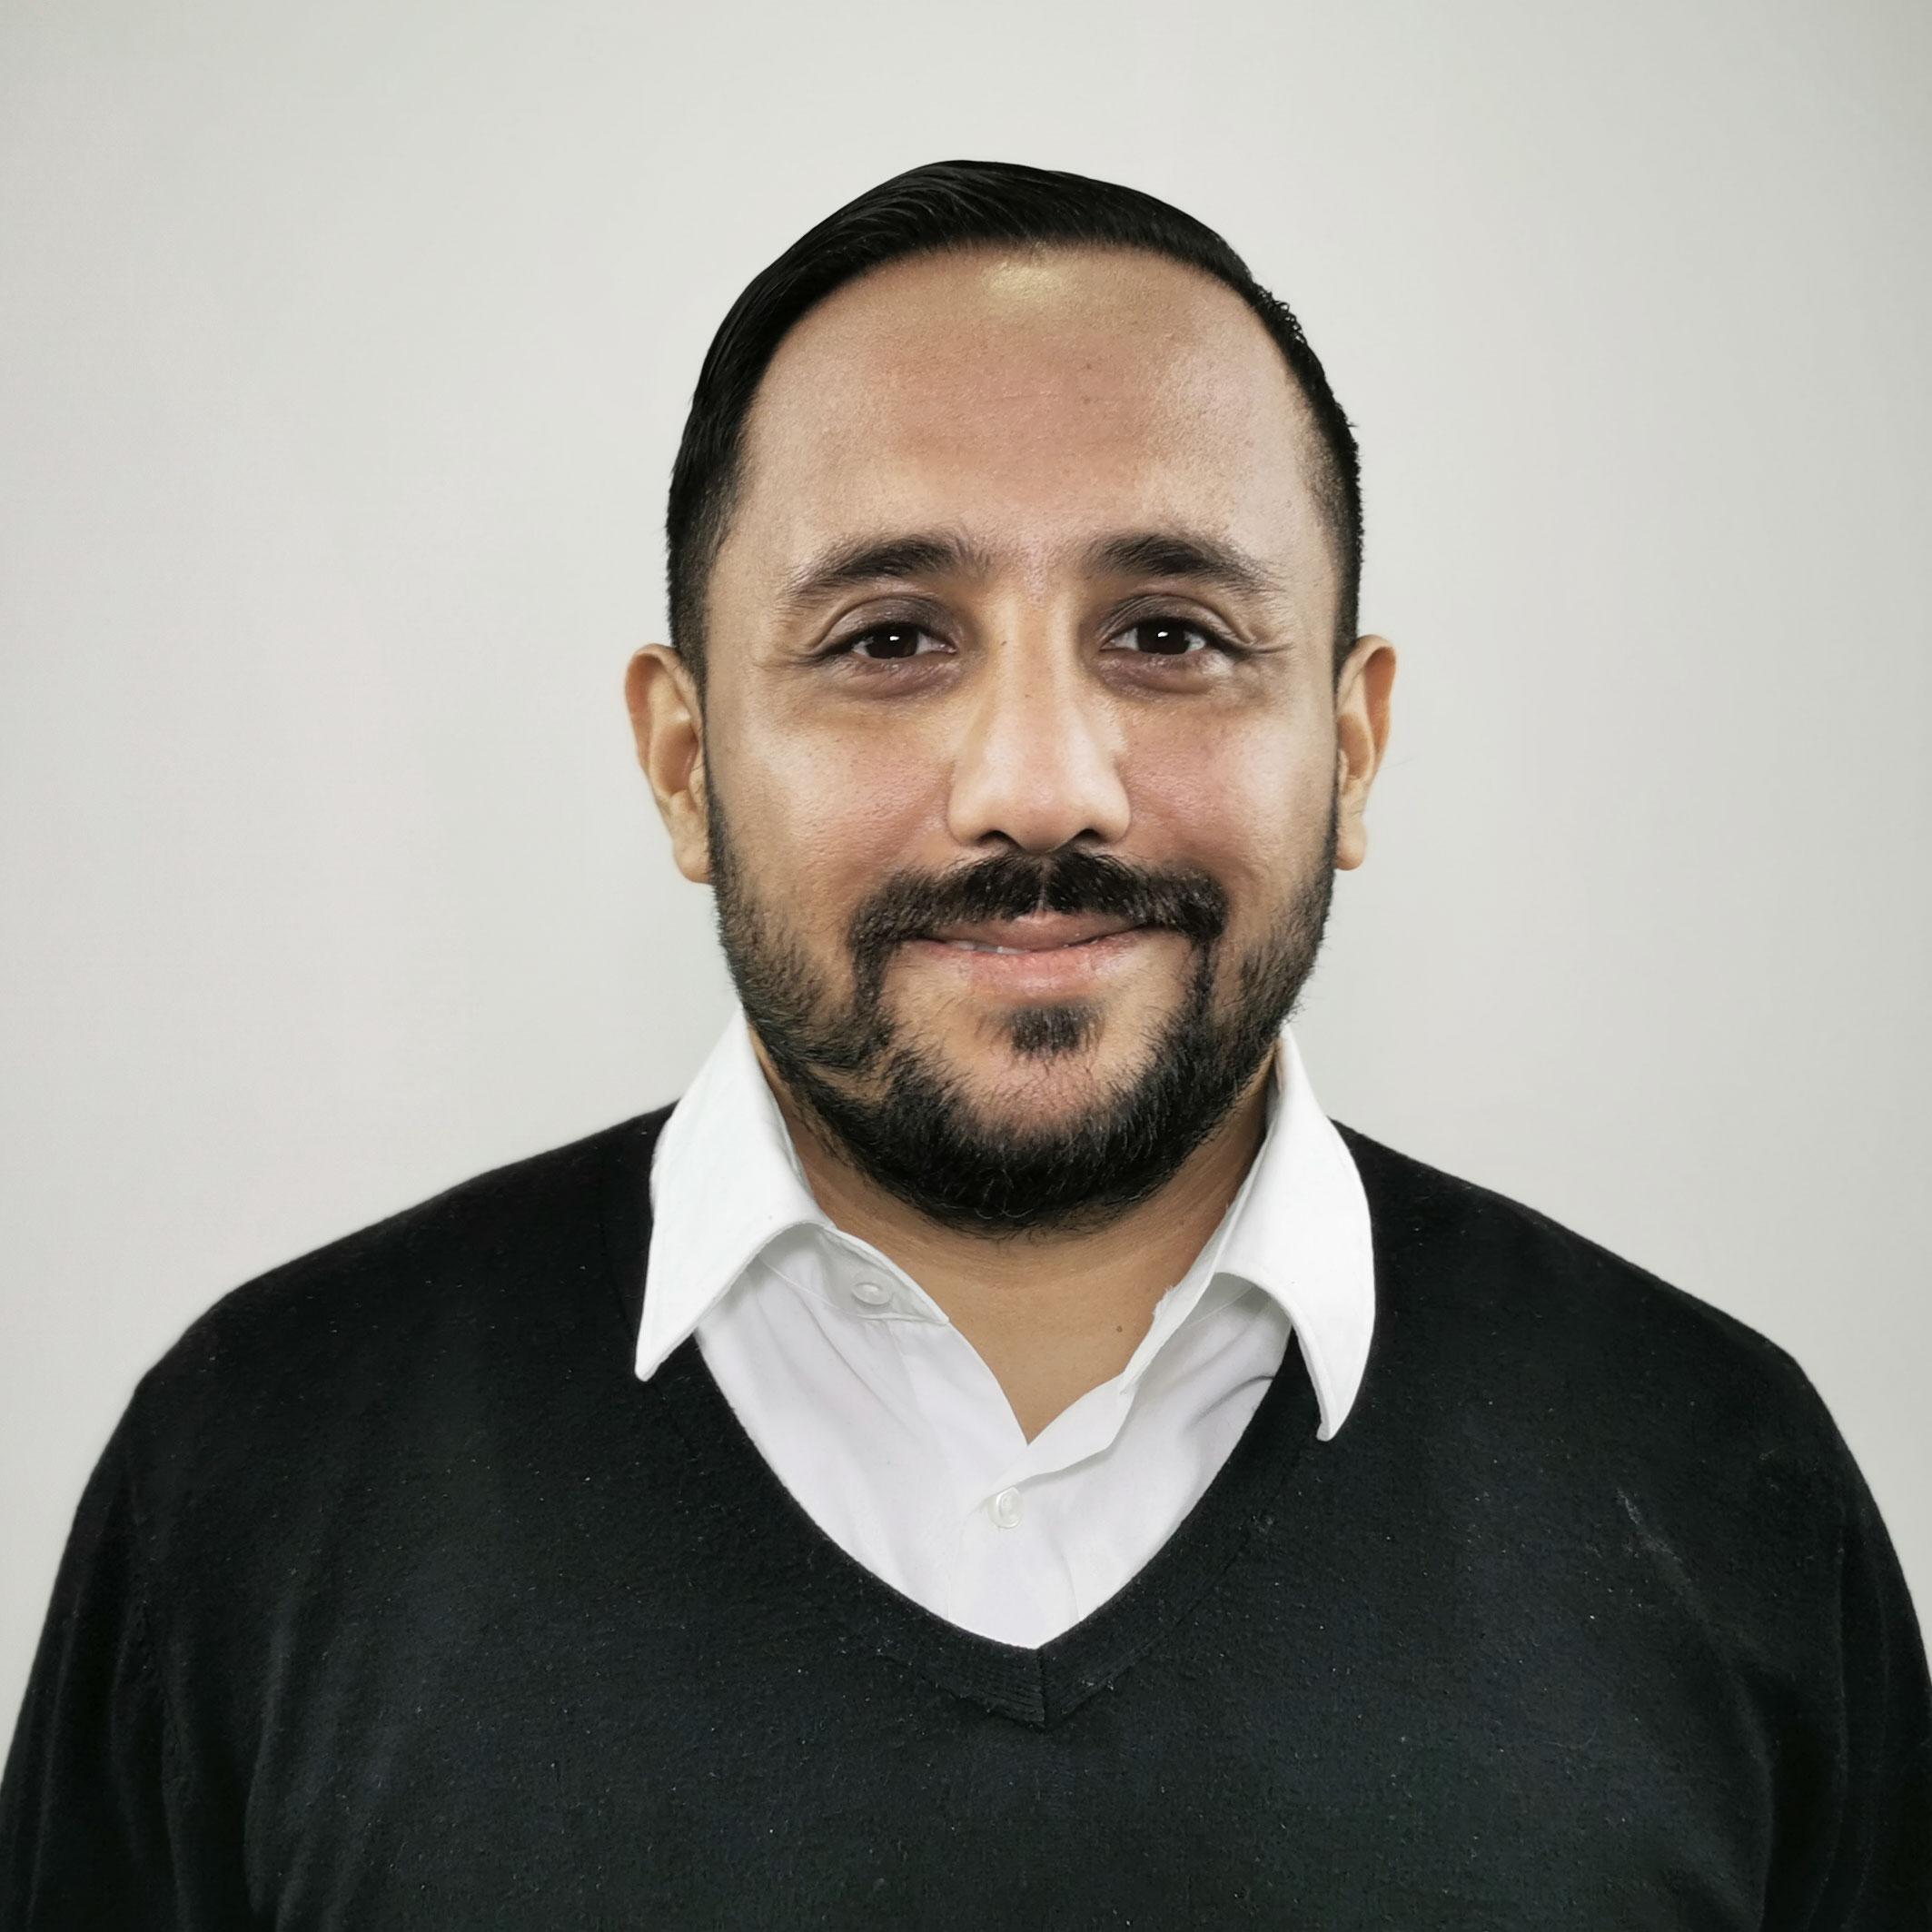 Portrait von Omid Rahimi